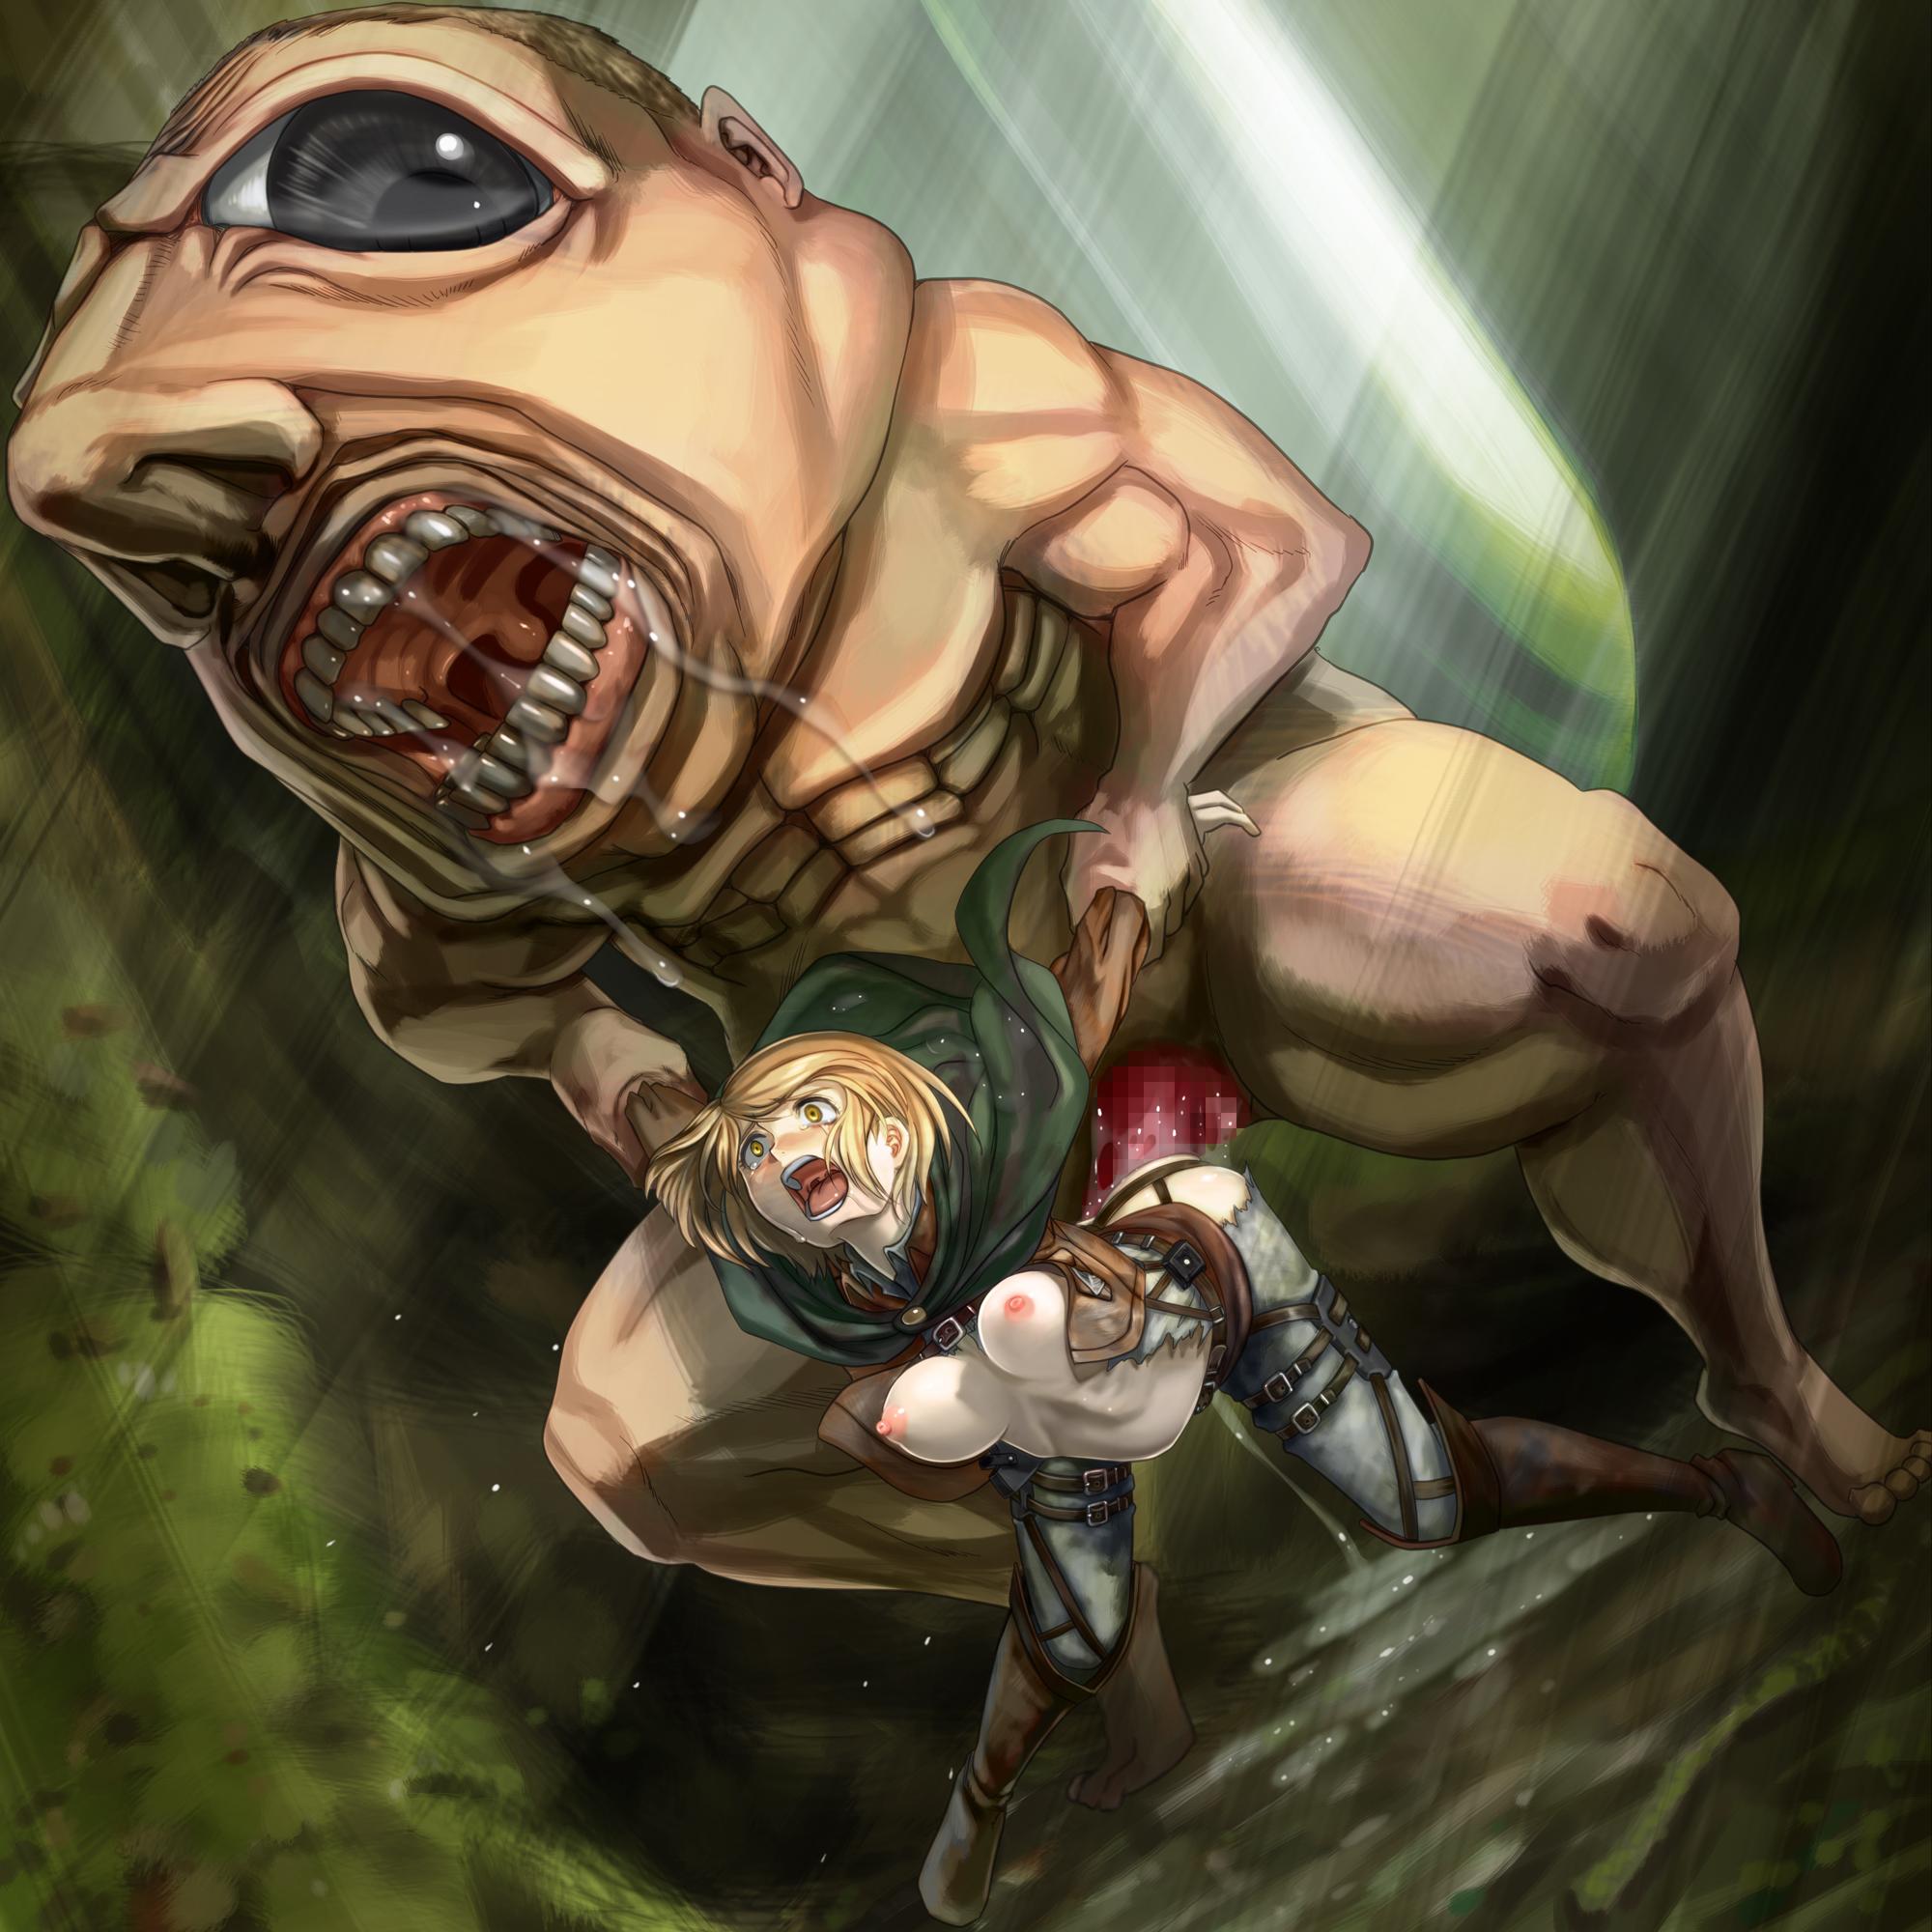 petra ral hentai rape by titan